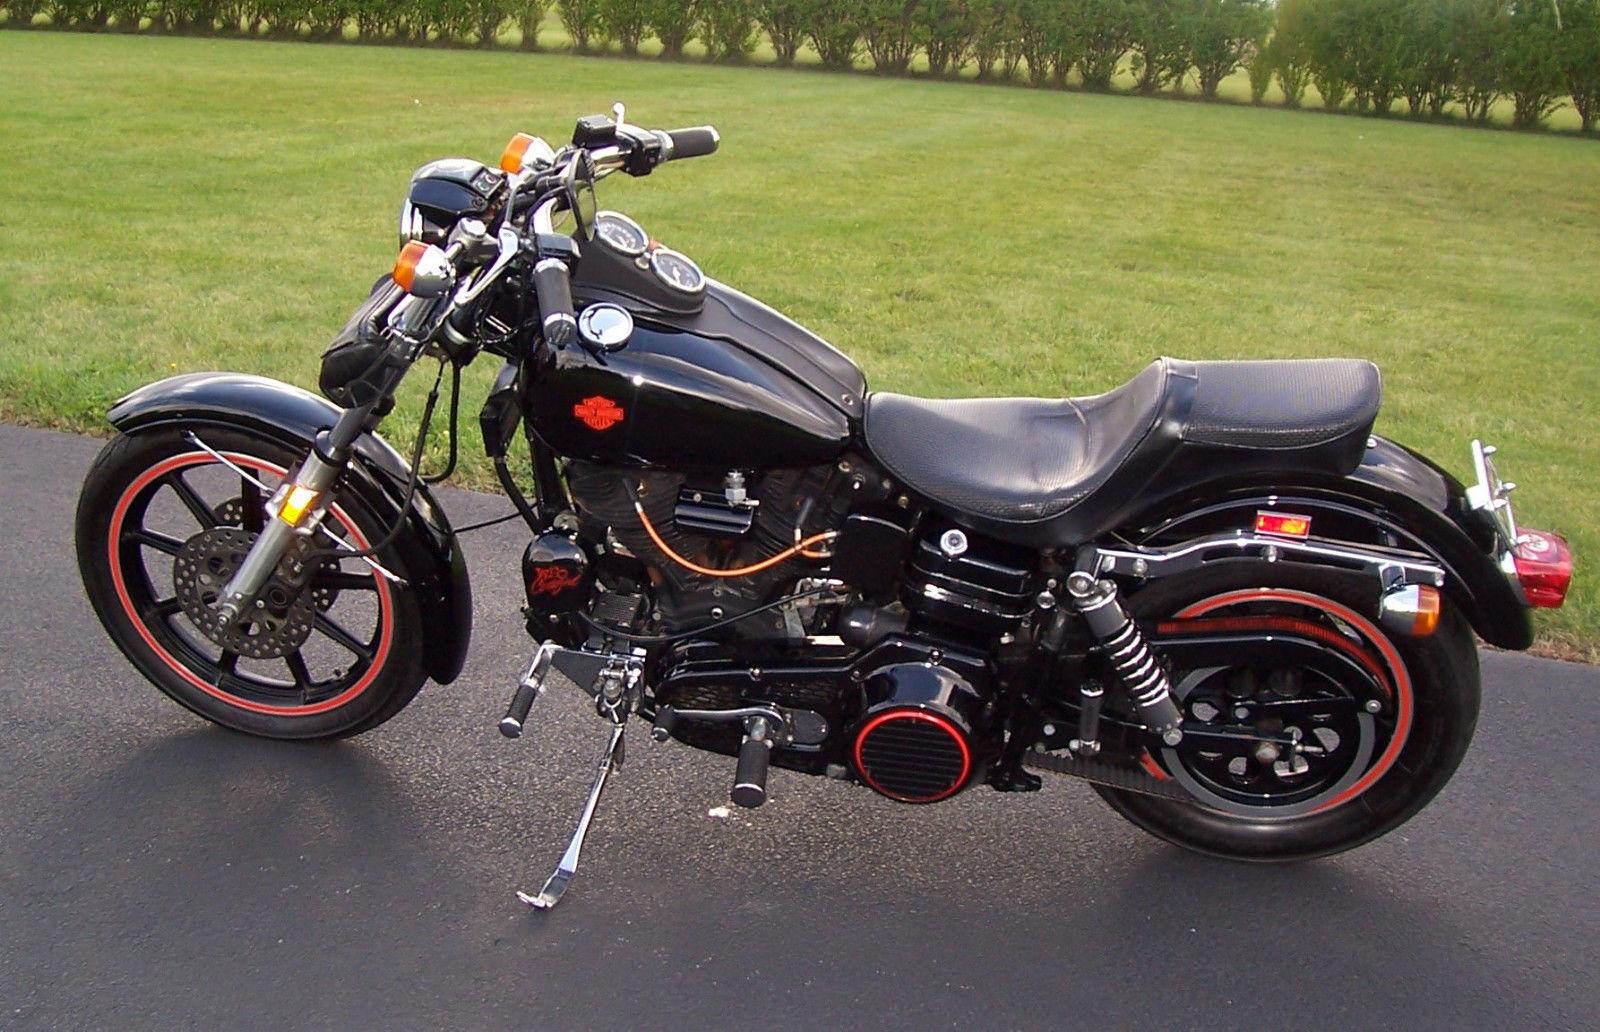 Harley Davidson Motorcycle Belts